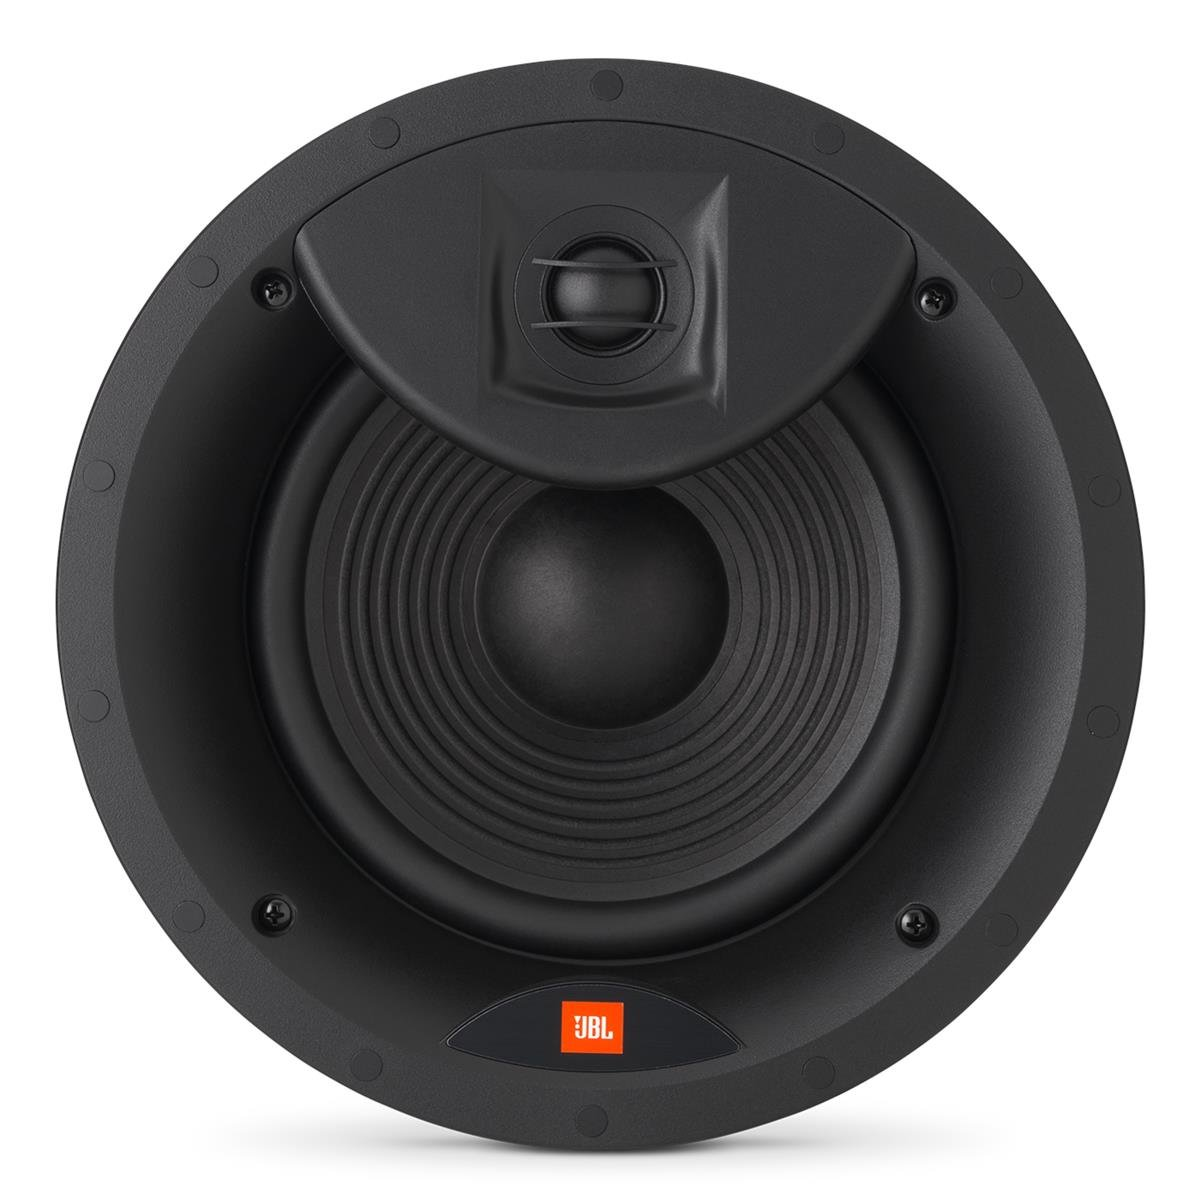 Jbl Home Speakers >> Jbl Surround In Ceiling Home Speaker Set Of 1 White Arena 6ic